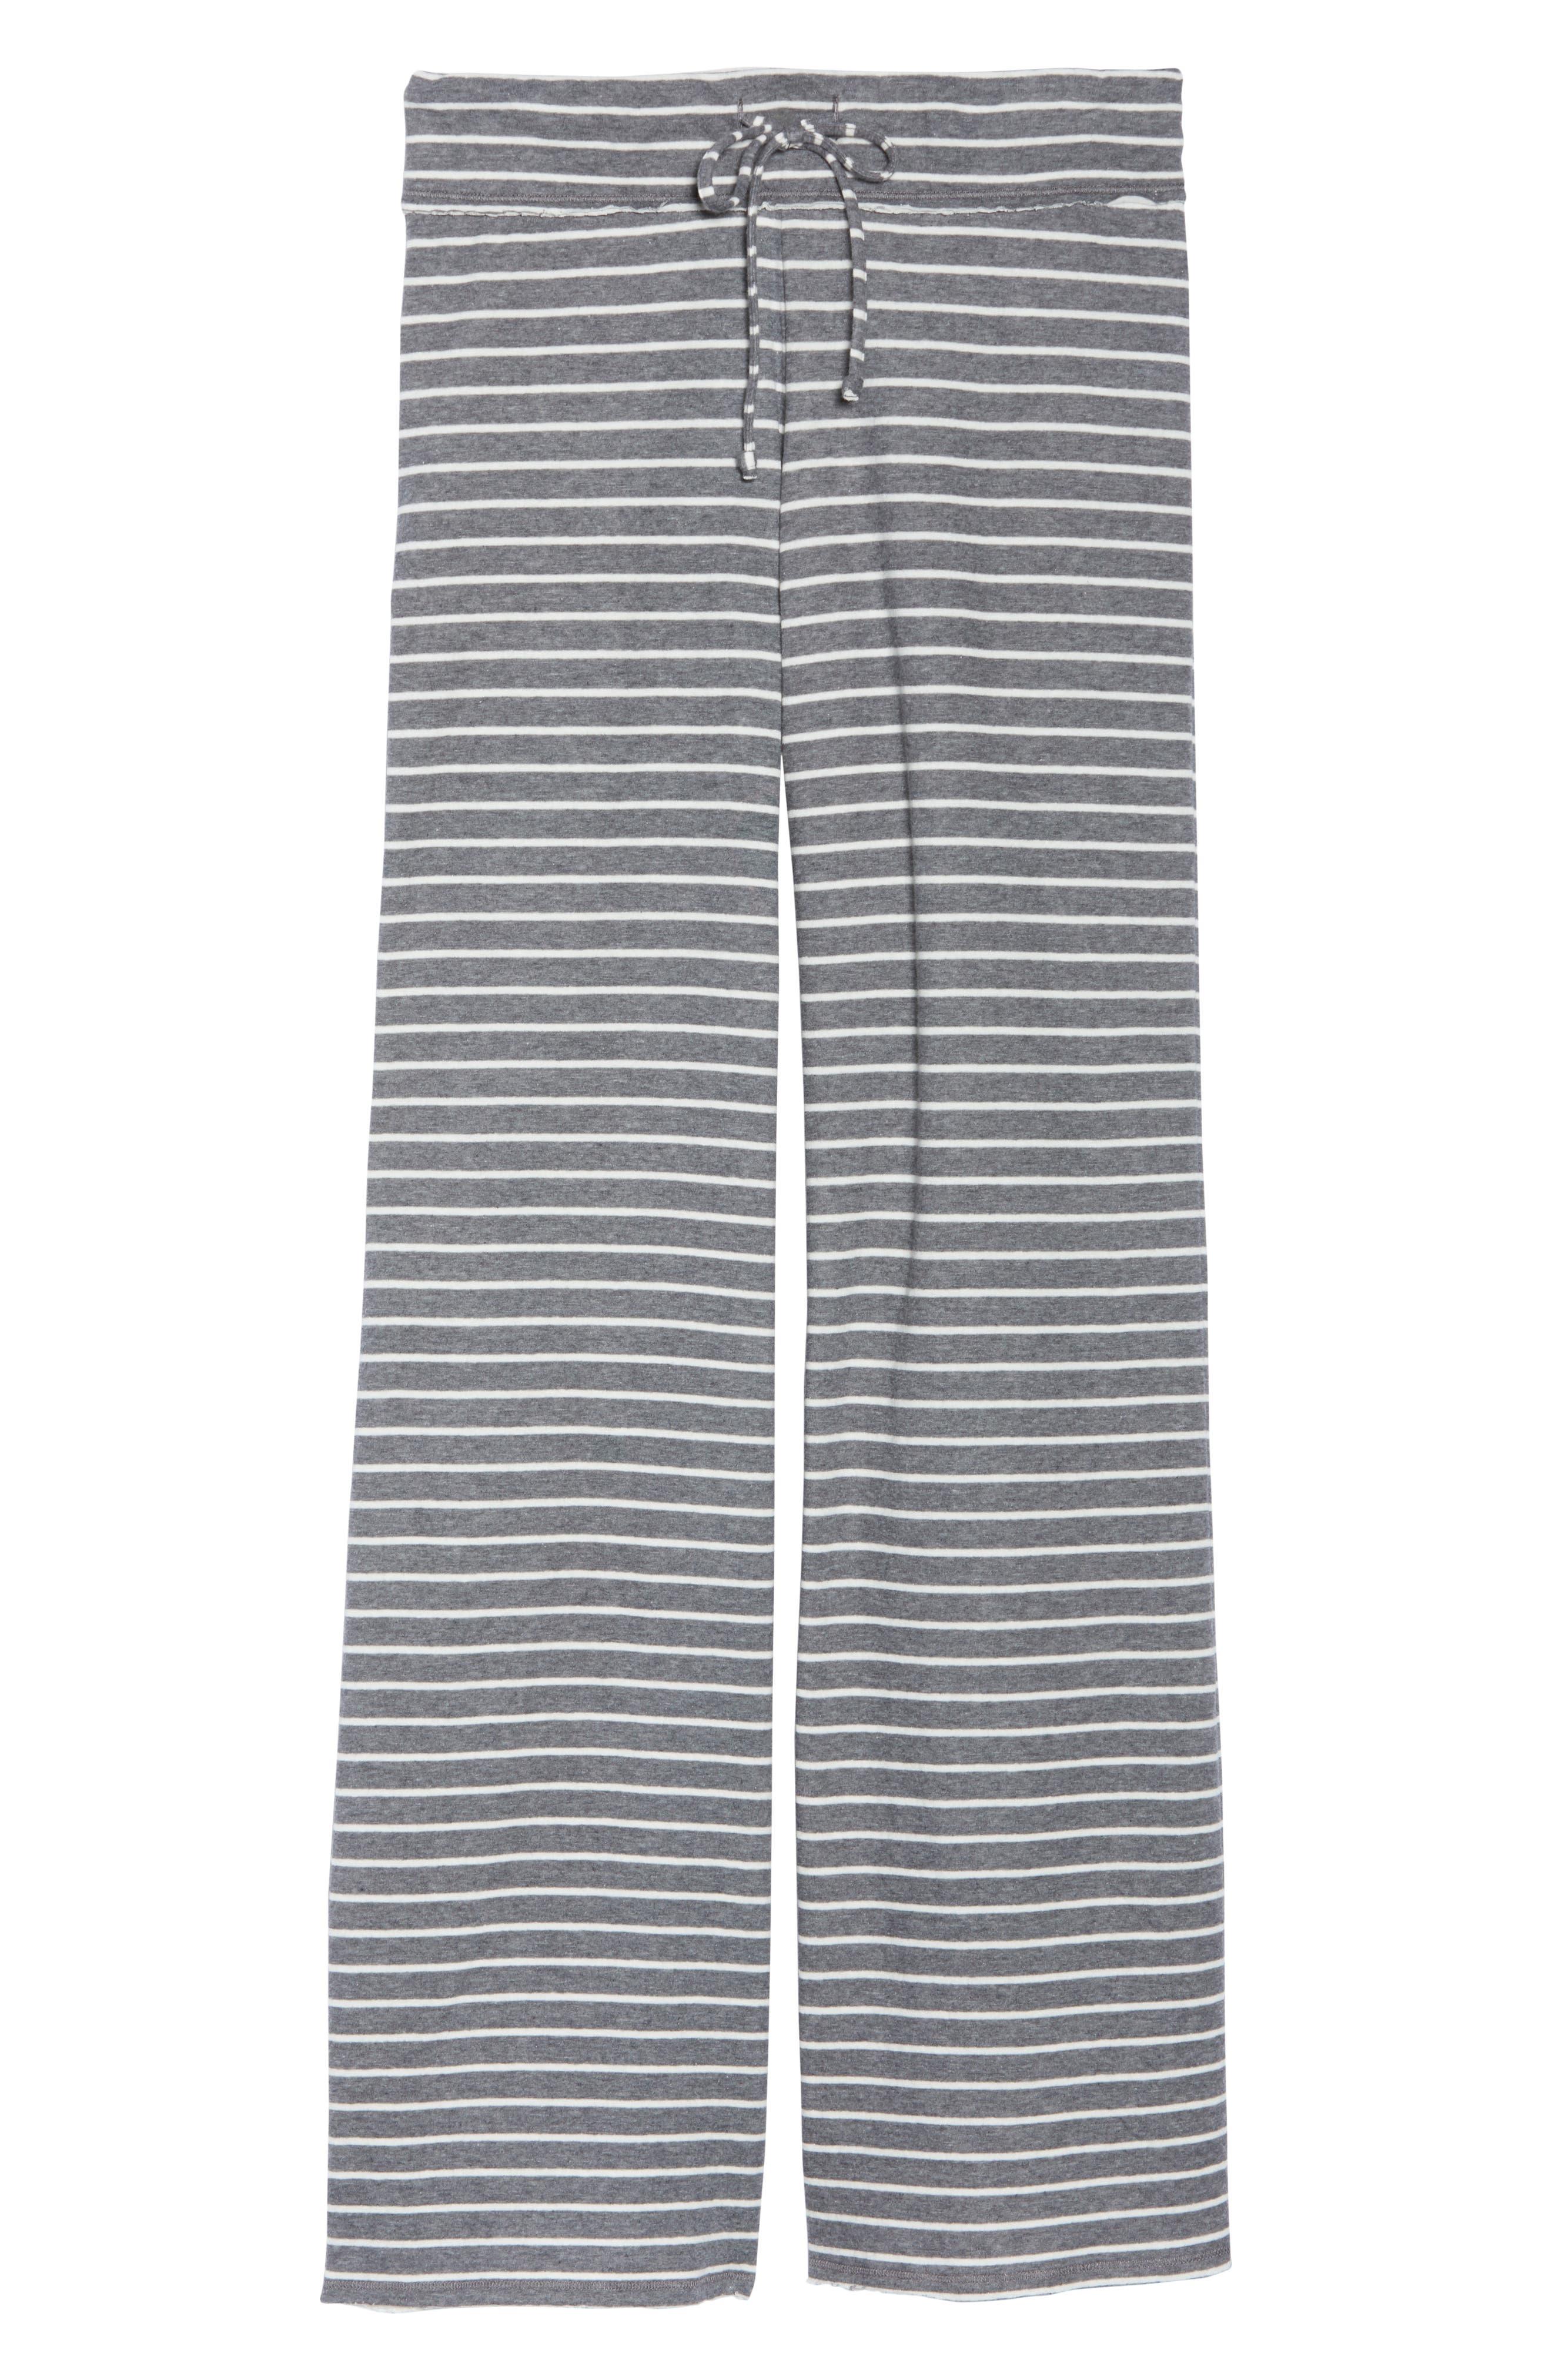 'Lazy Mornings' Lounge Pants,                             Alternate thumbnail 6, color,                             GREY PAVEMENT BELLA STRIPE